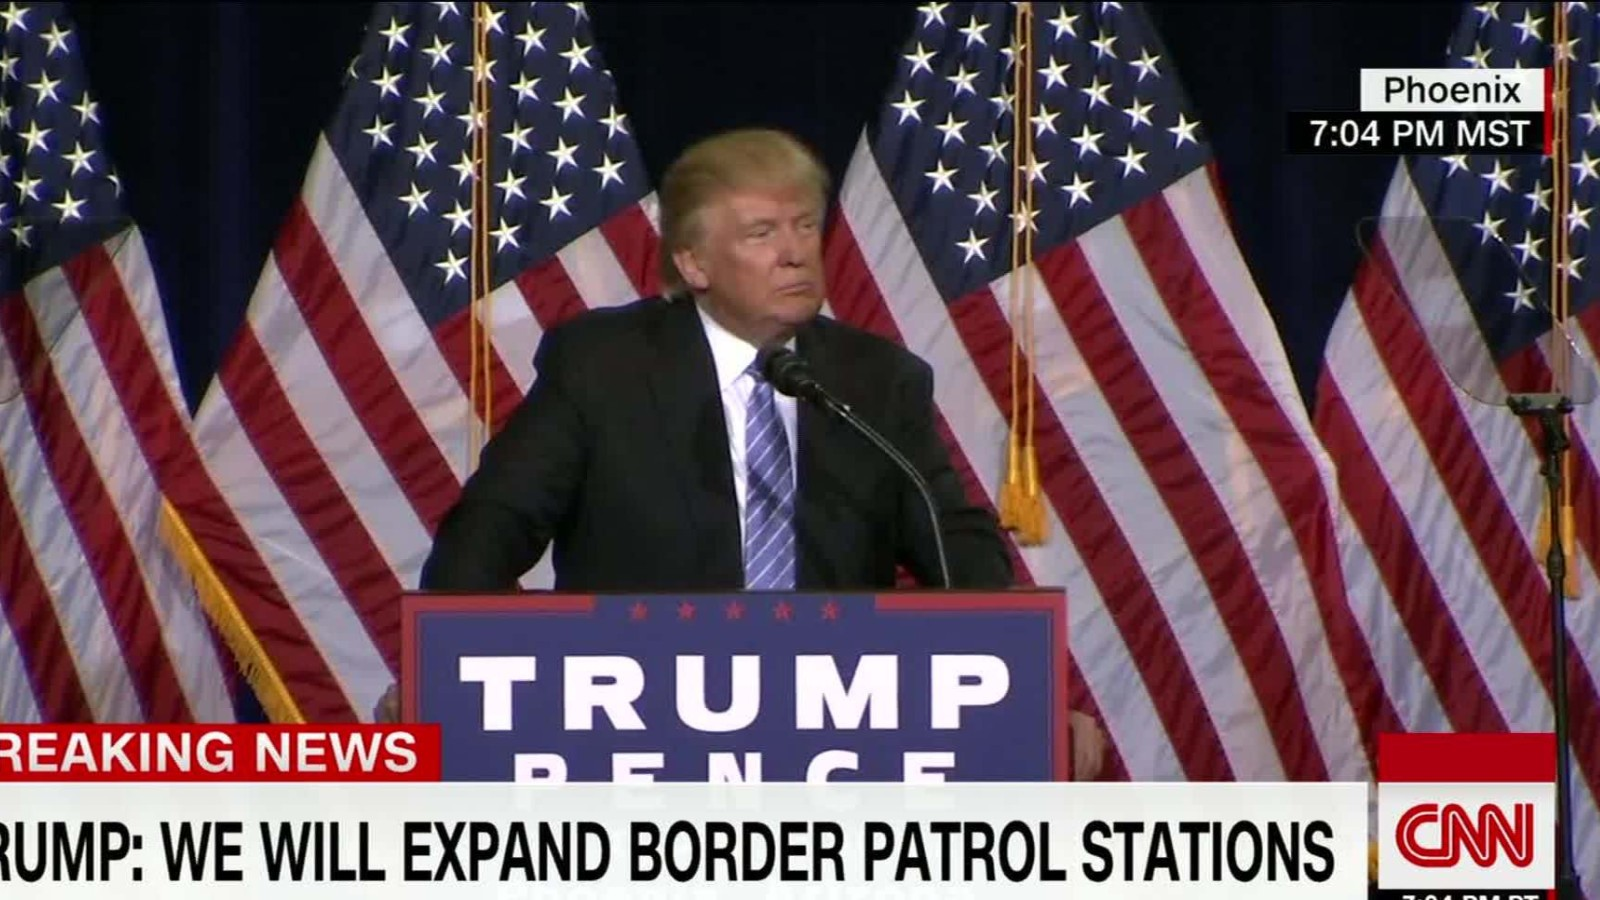 160831222737 donald trump immigration block funding executive order visa tracking speech bts 02 00000913 full 169 donald trump on immigration no amnesty, no pivot cnnpolitics